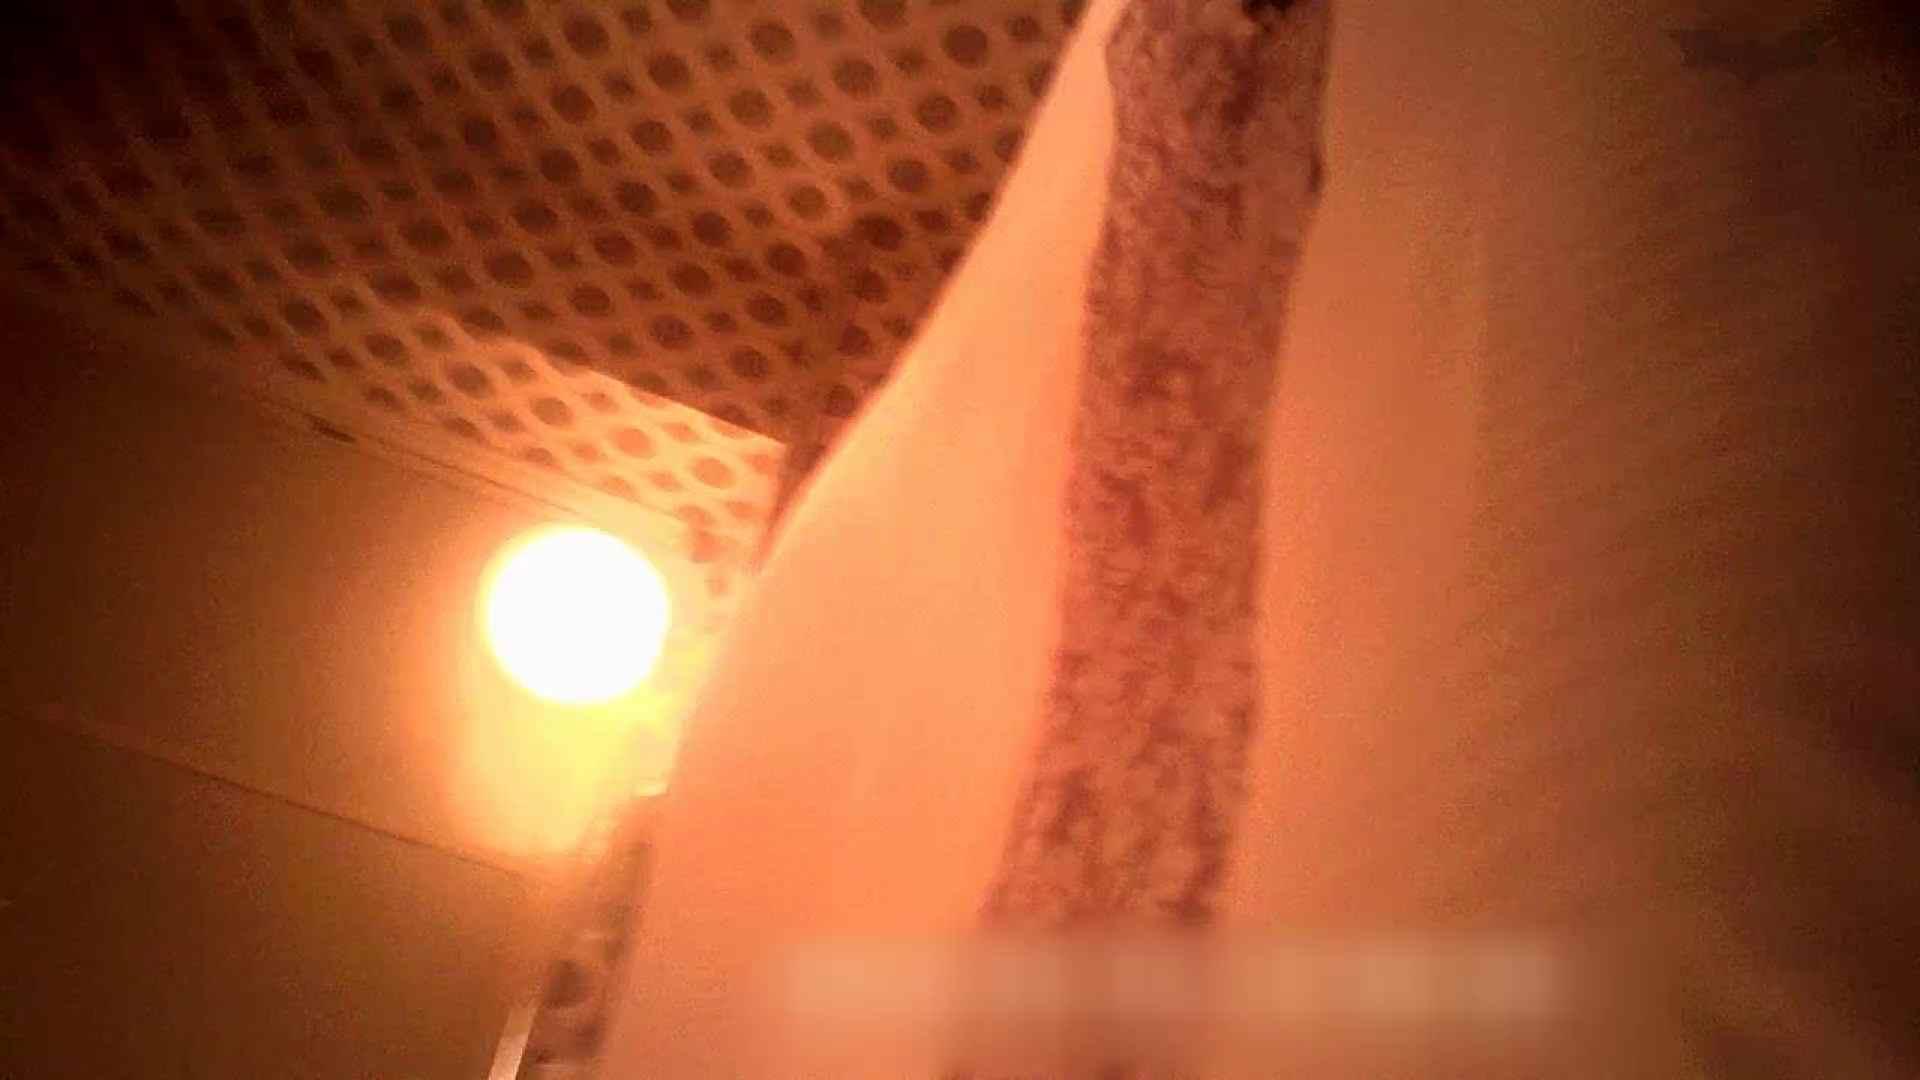 ▲2017_13位▲ 学園アイドル美人女子大生❷(下巻)5人詰合せVol.50 女子大生  107連発 84